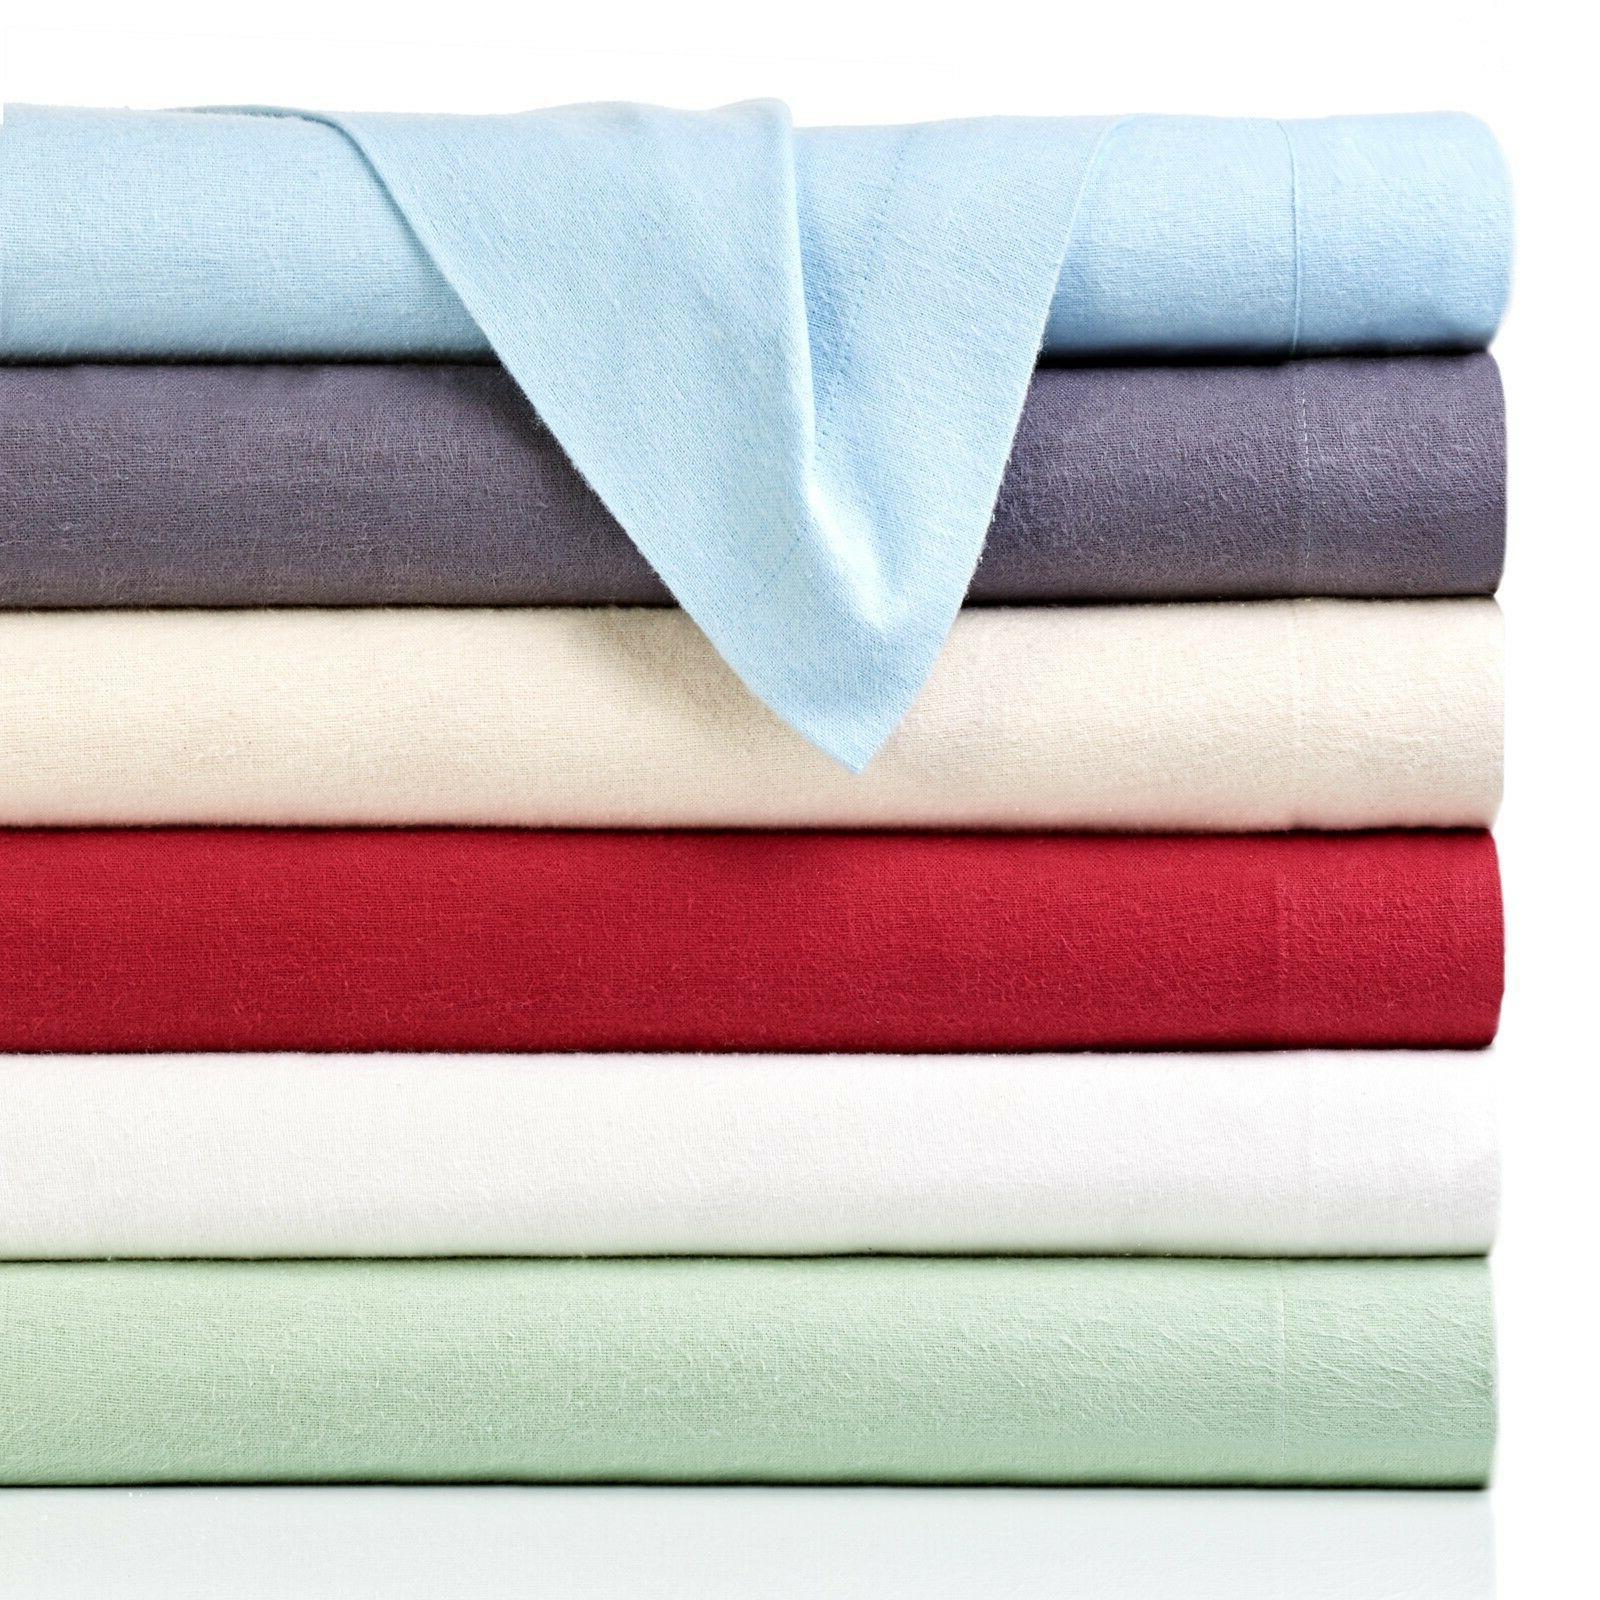 Bibb Home 100% Solid Sheet - Cozy, Deep Pocket